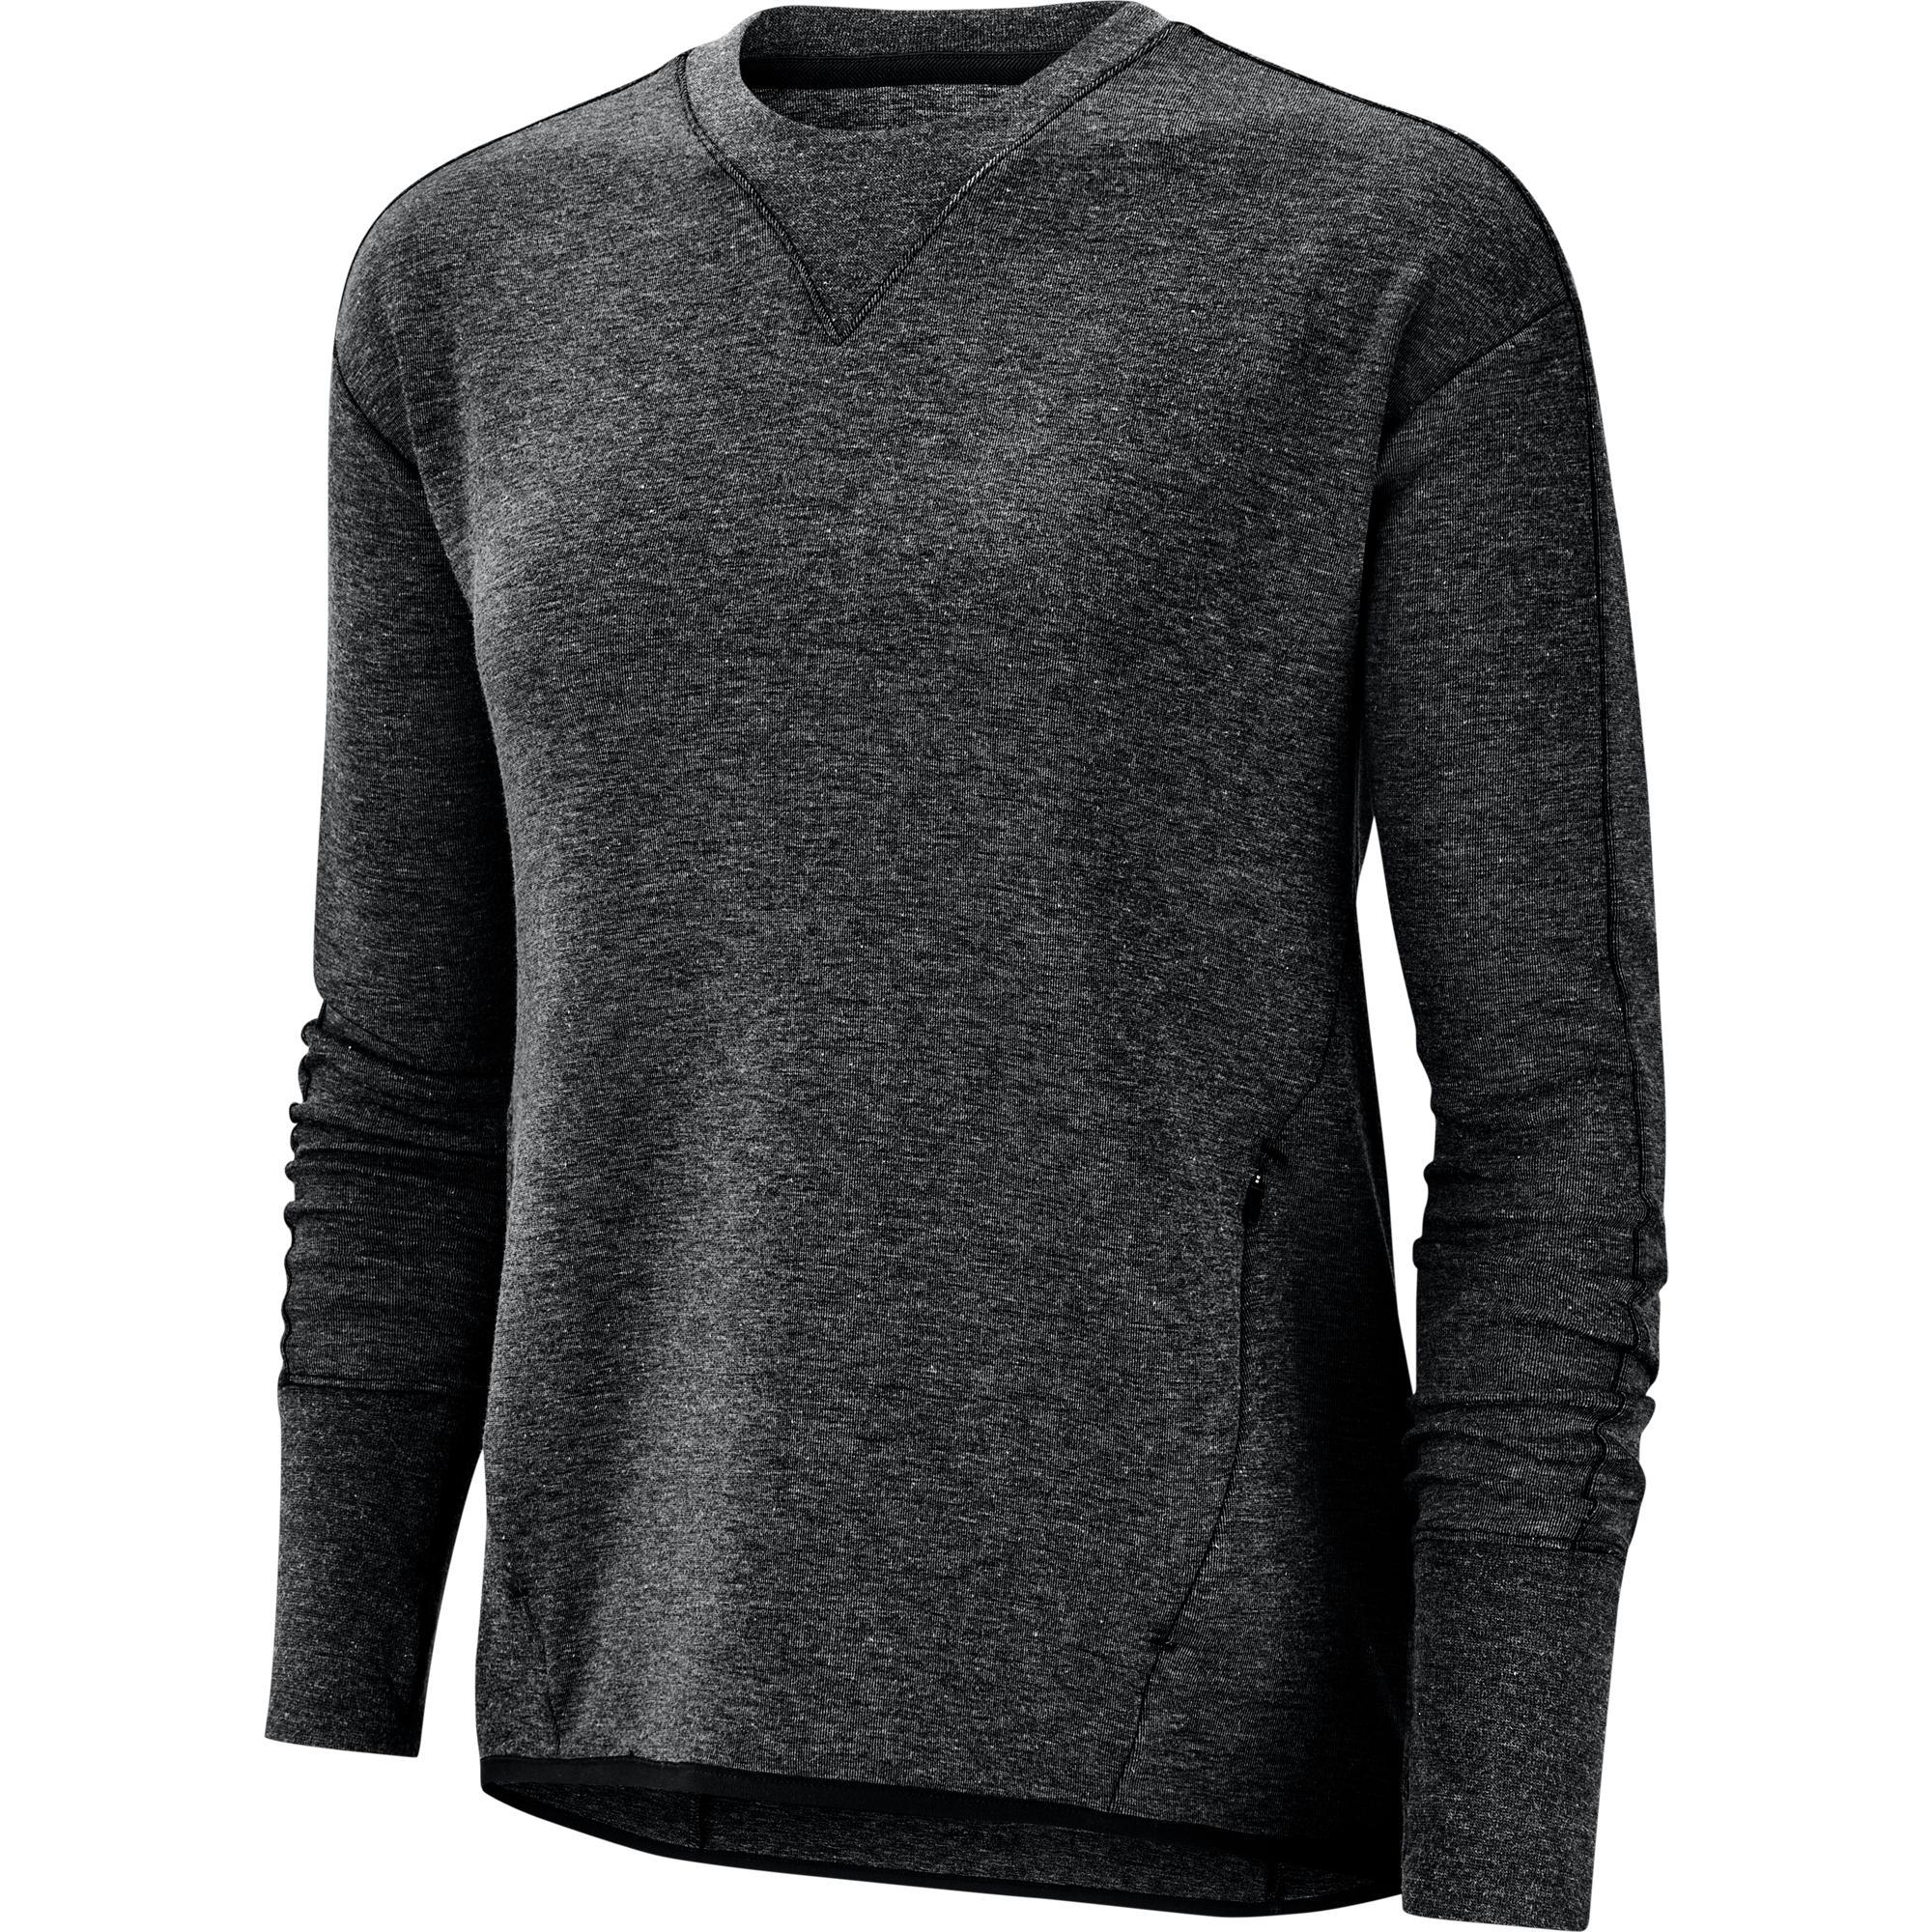 Women's Dri-FIT UV Crew Neck Long Sleeve Pullover